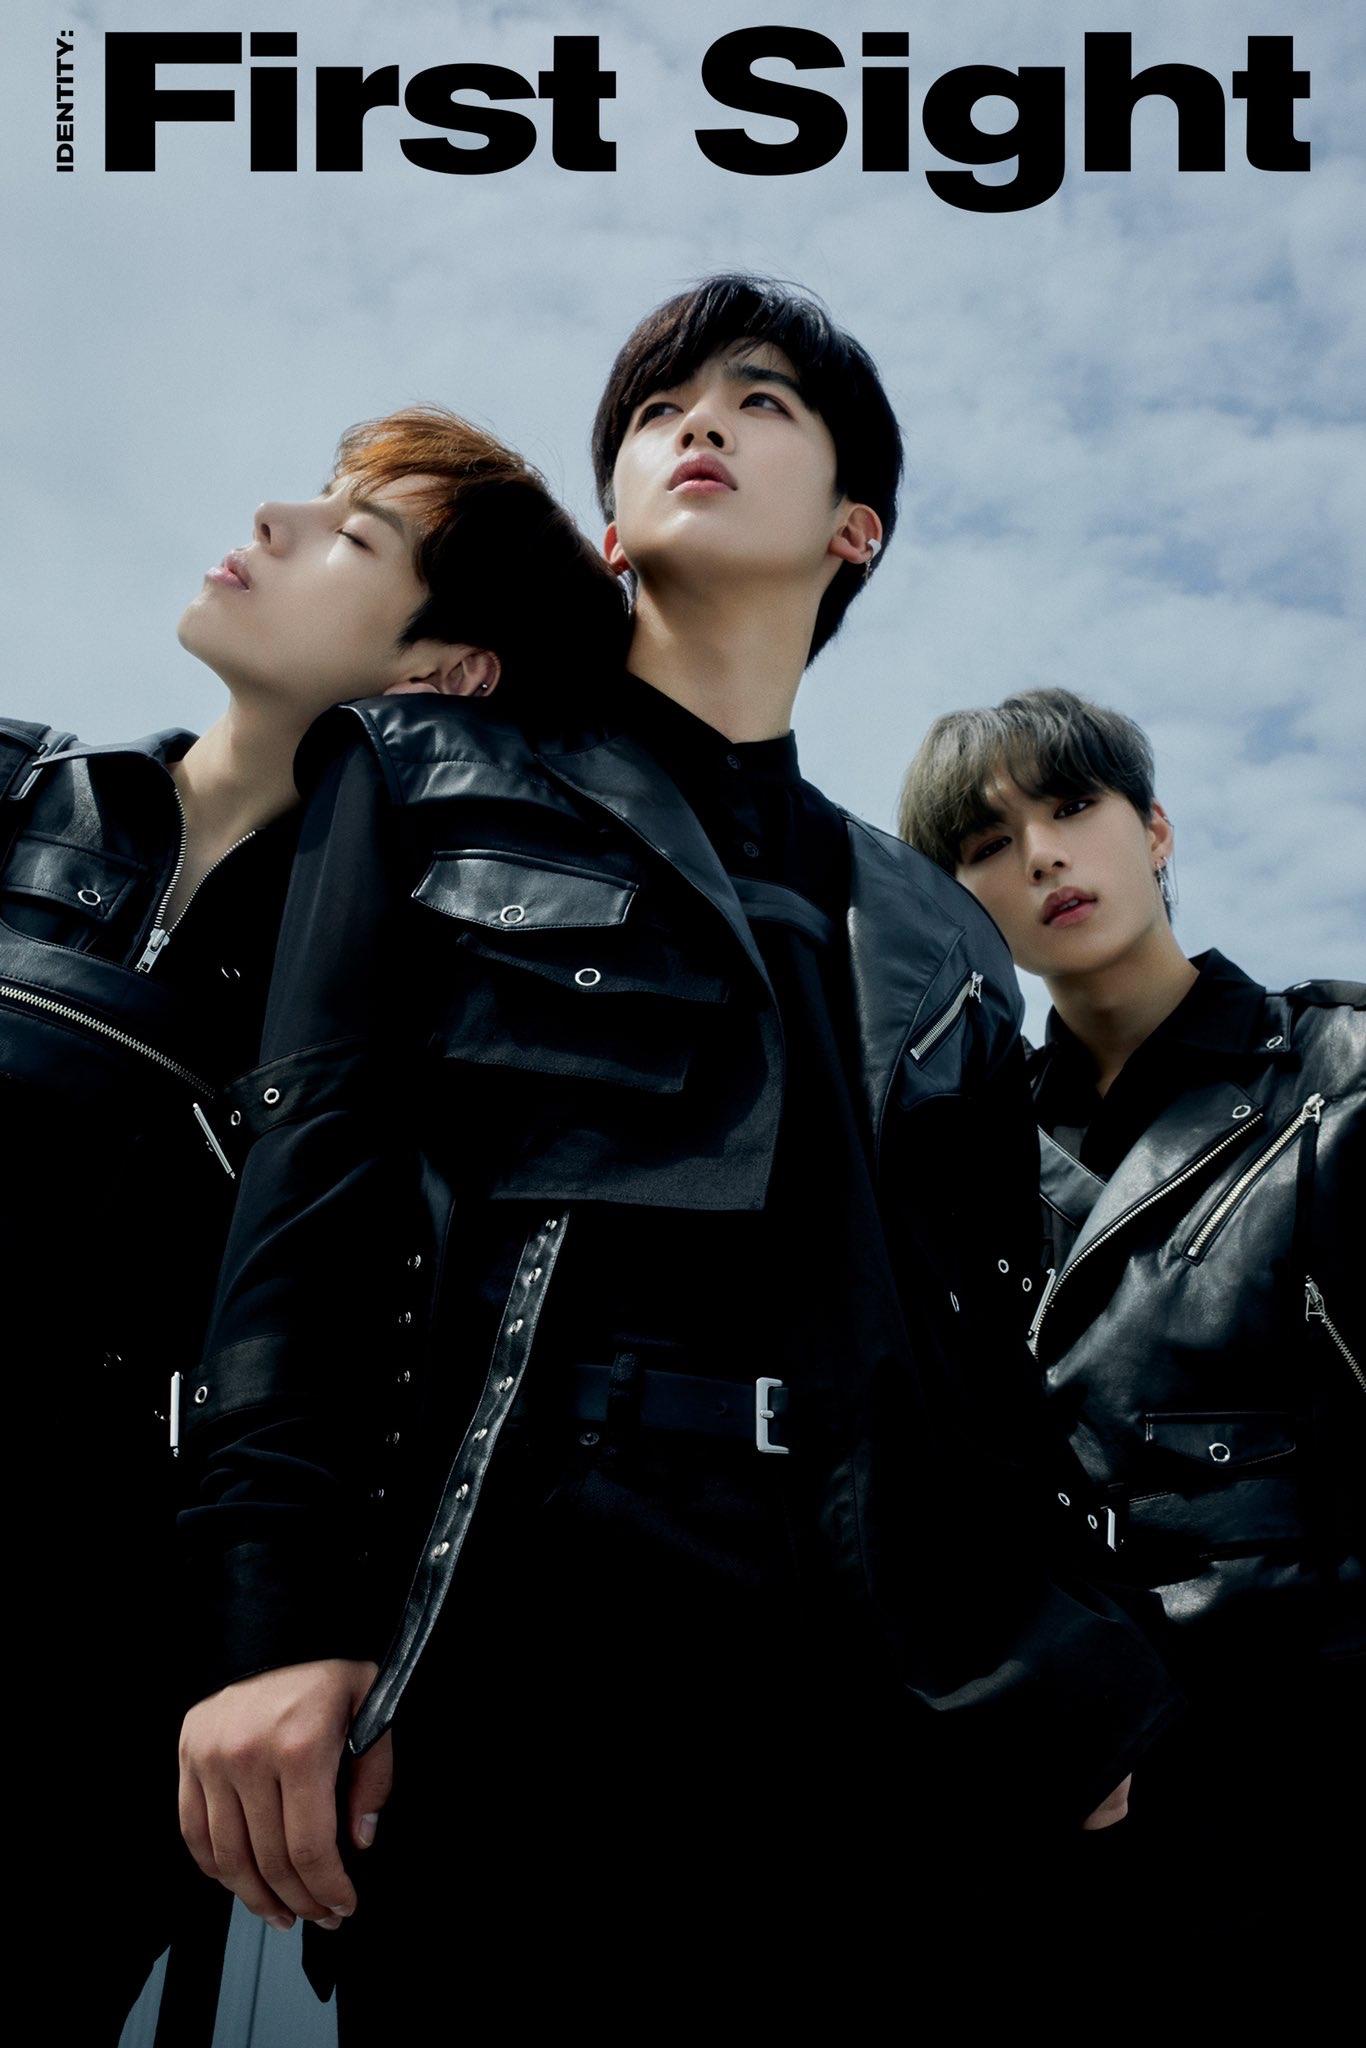 WEi First Album first teaser image. Jang Dae Hyeon, Kim Yo Han and Kim Jun Seo.